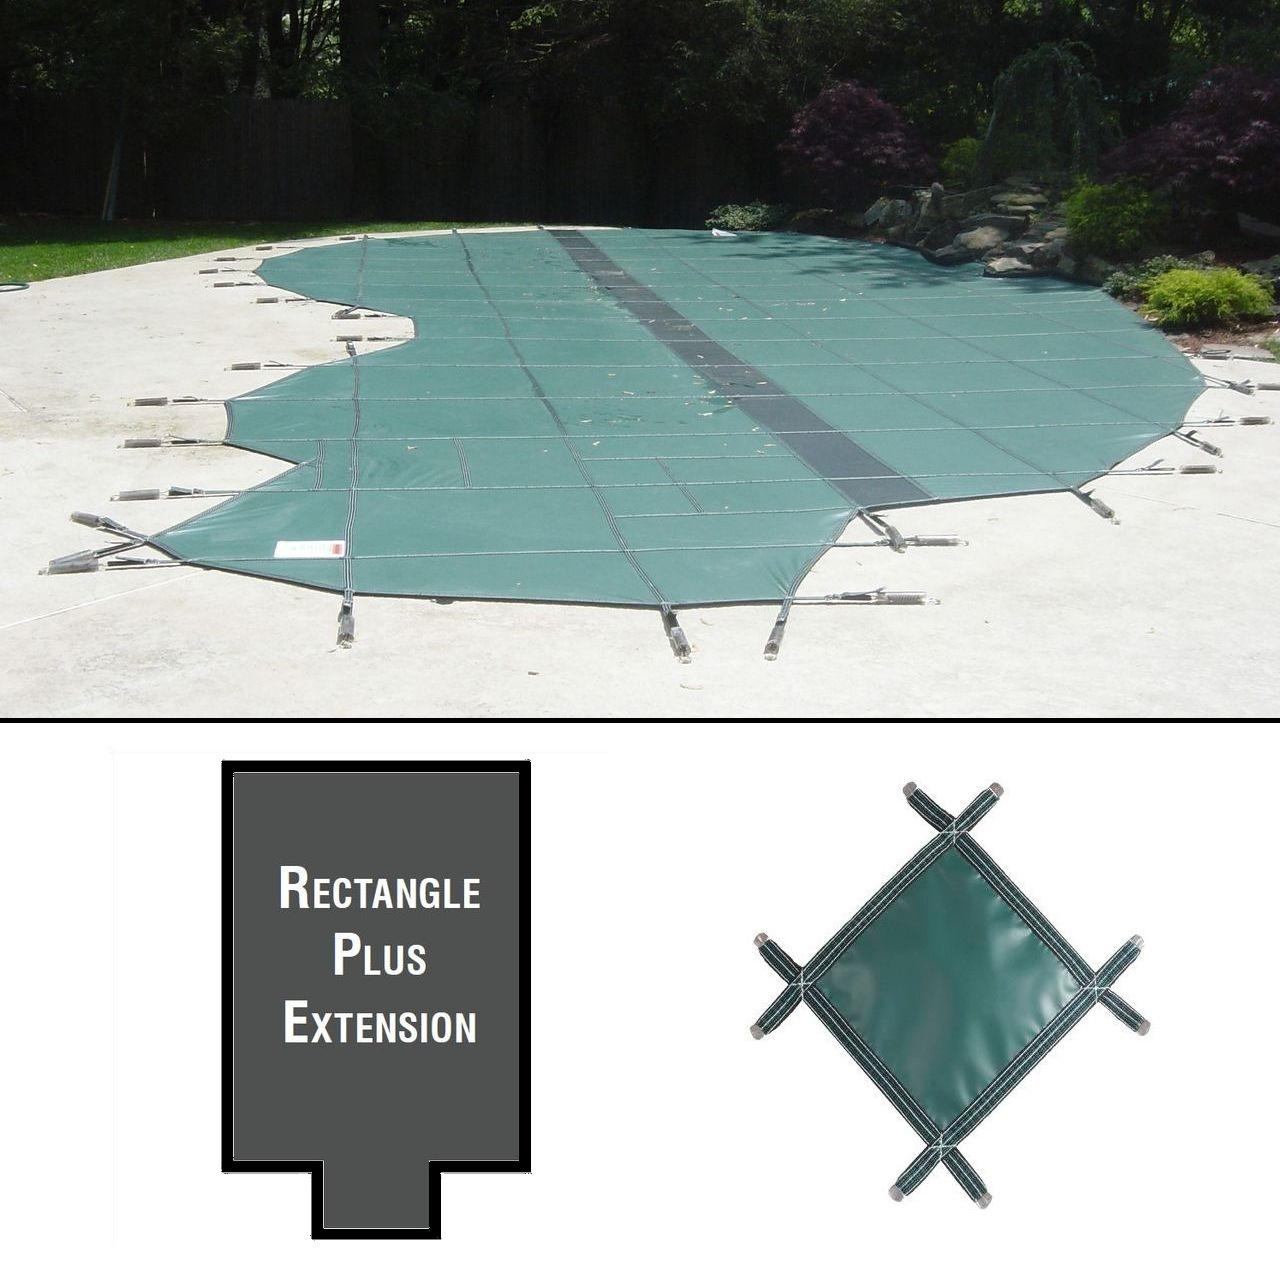 PermaGuard 20'x42' Rectangular Pool Cover Plus 4'x10' Extension